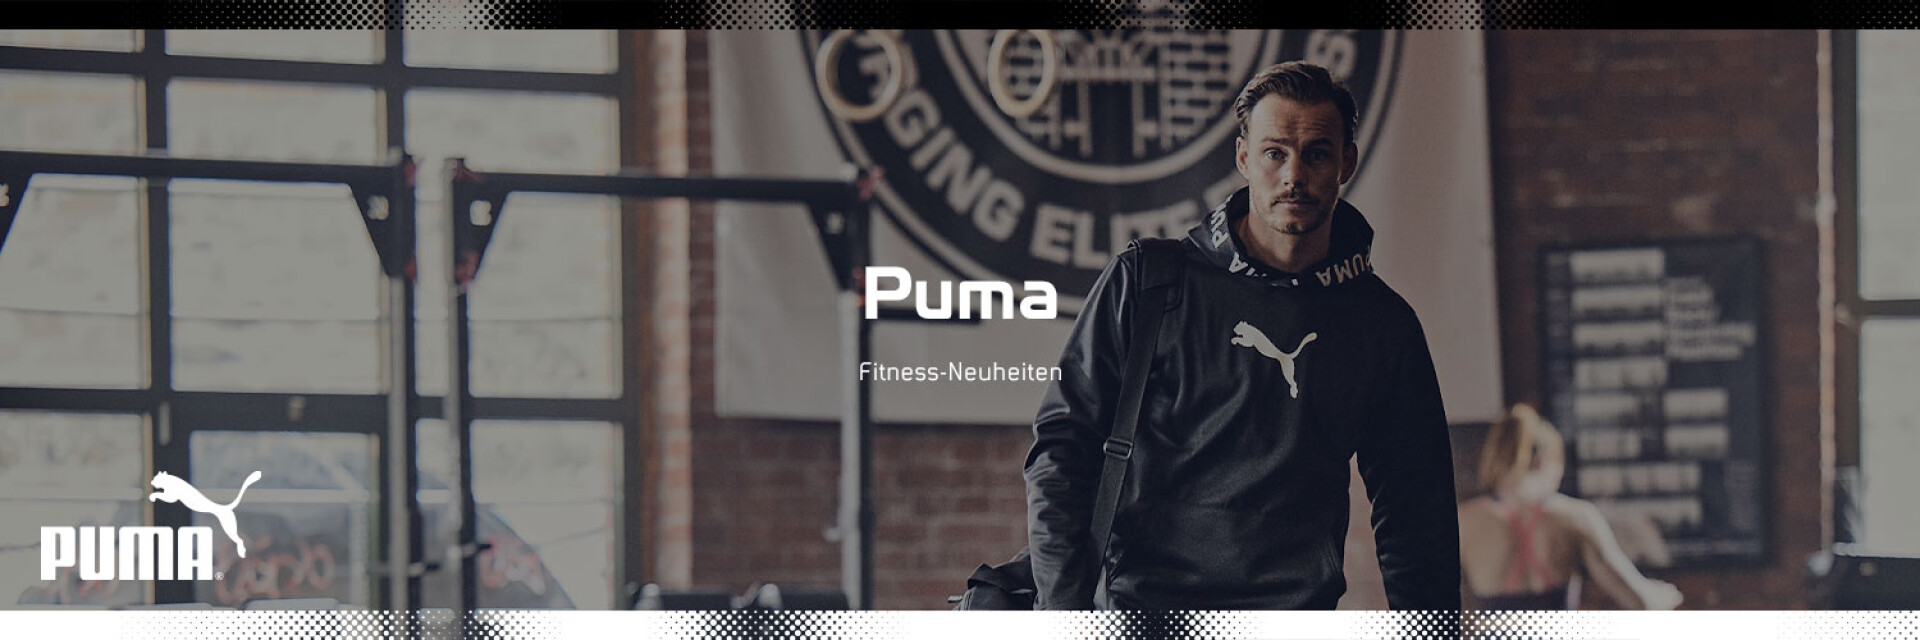 Puma Fitness Outfits bei SPORT 2000